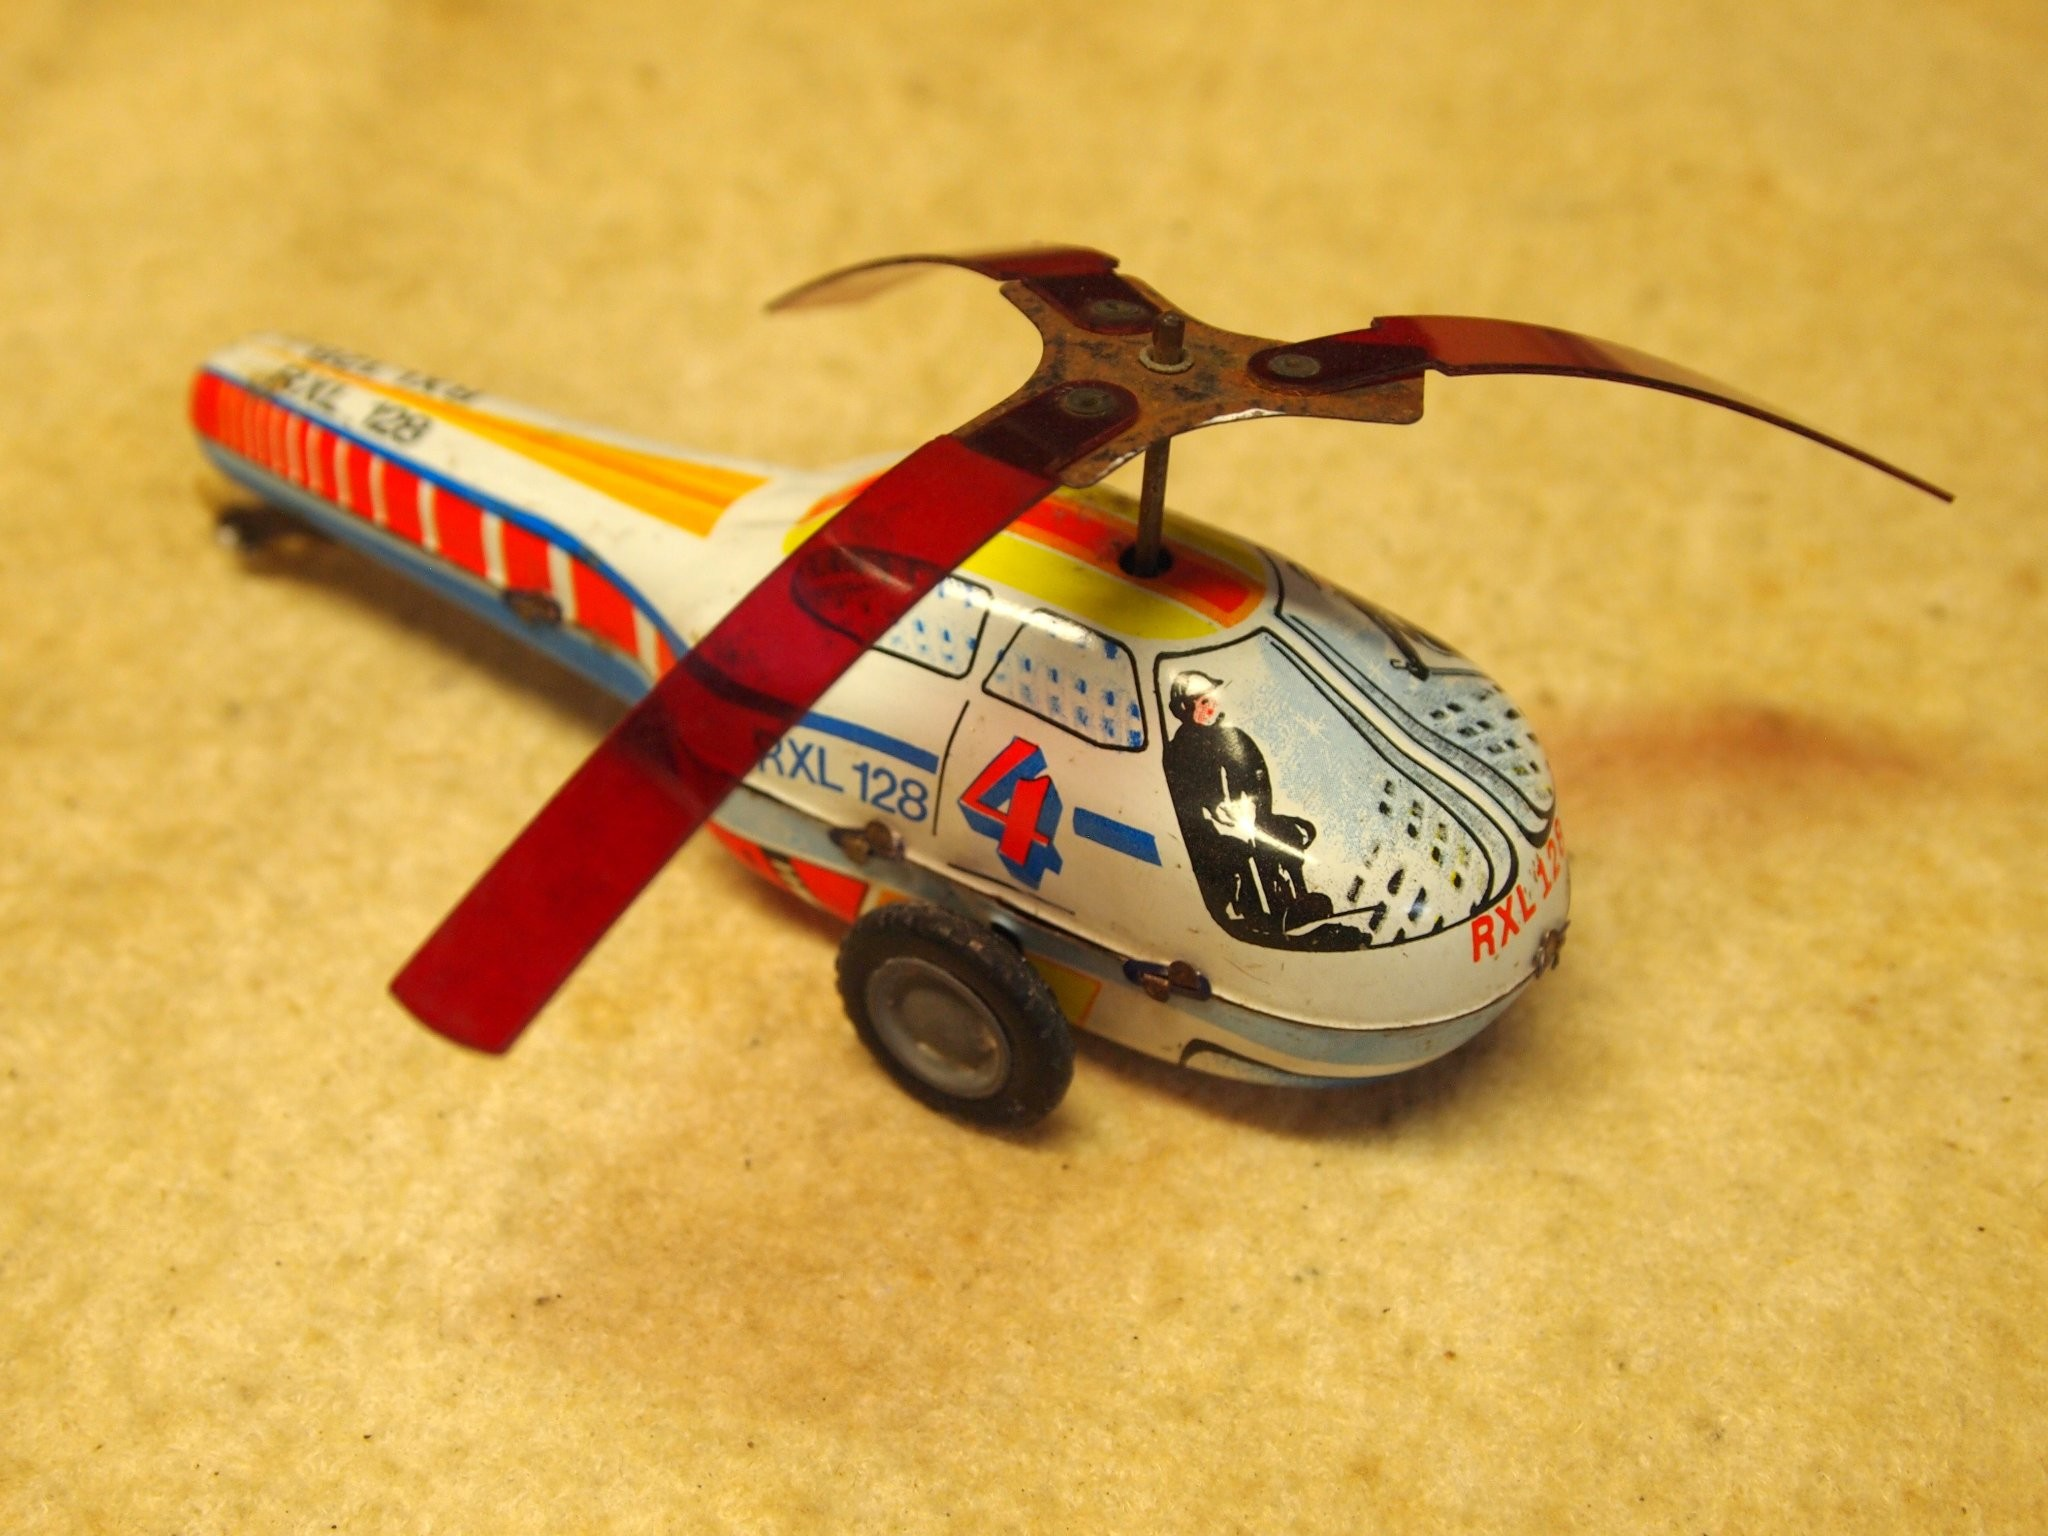 595de2a4a3718-helikopter-lemezarugyar-lemezjatekretro-jatek.jpg